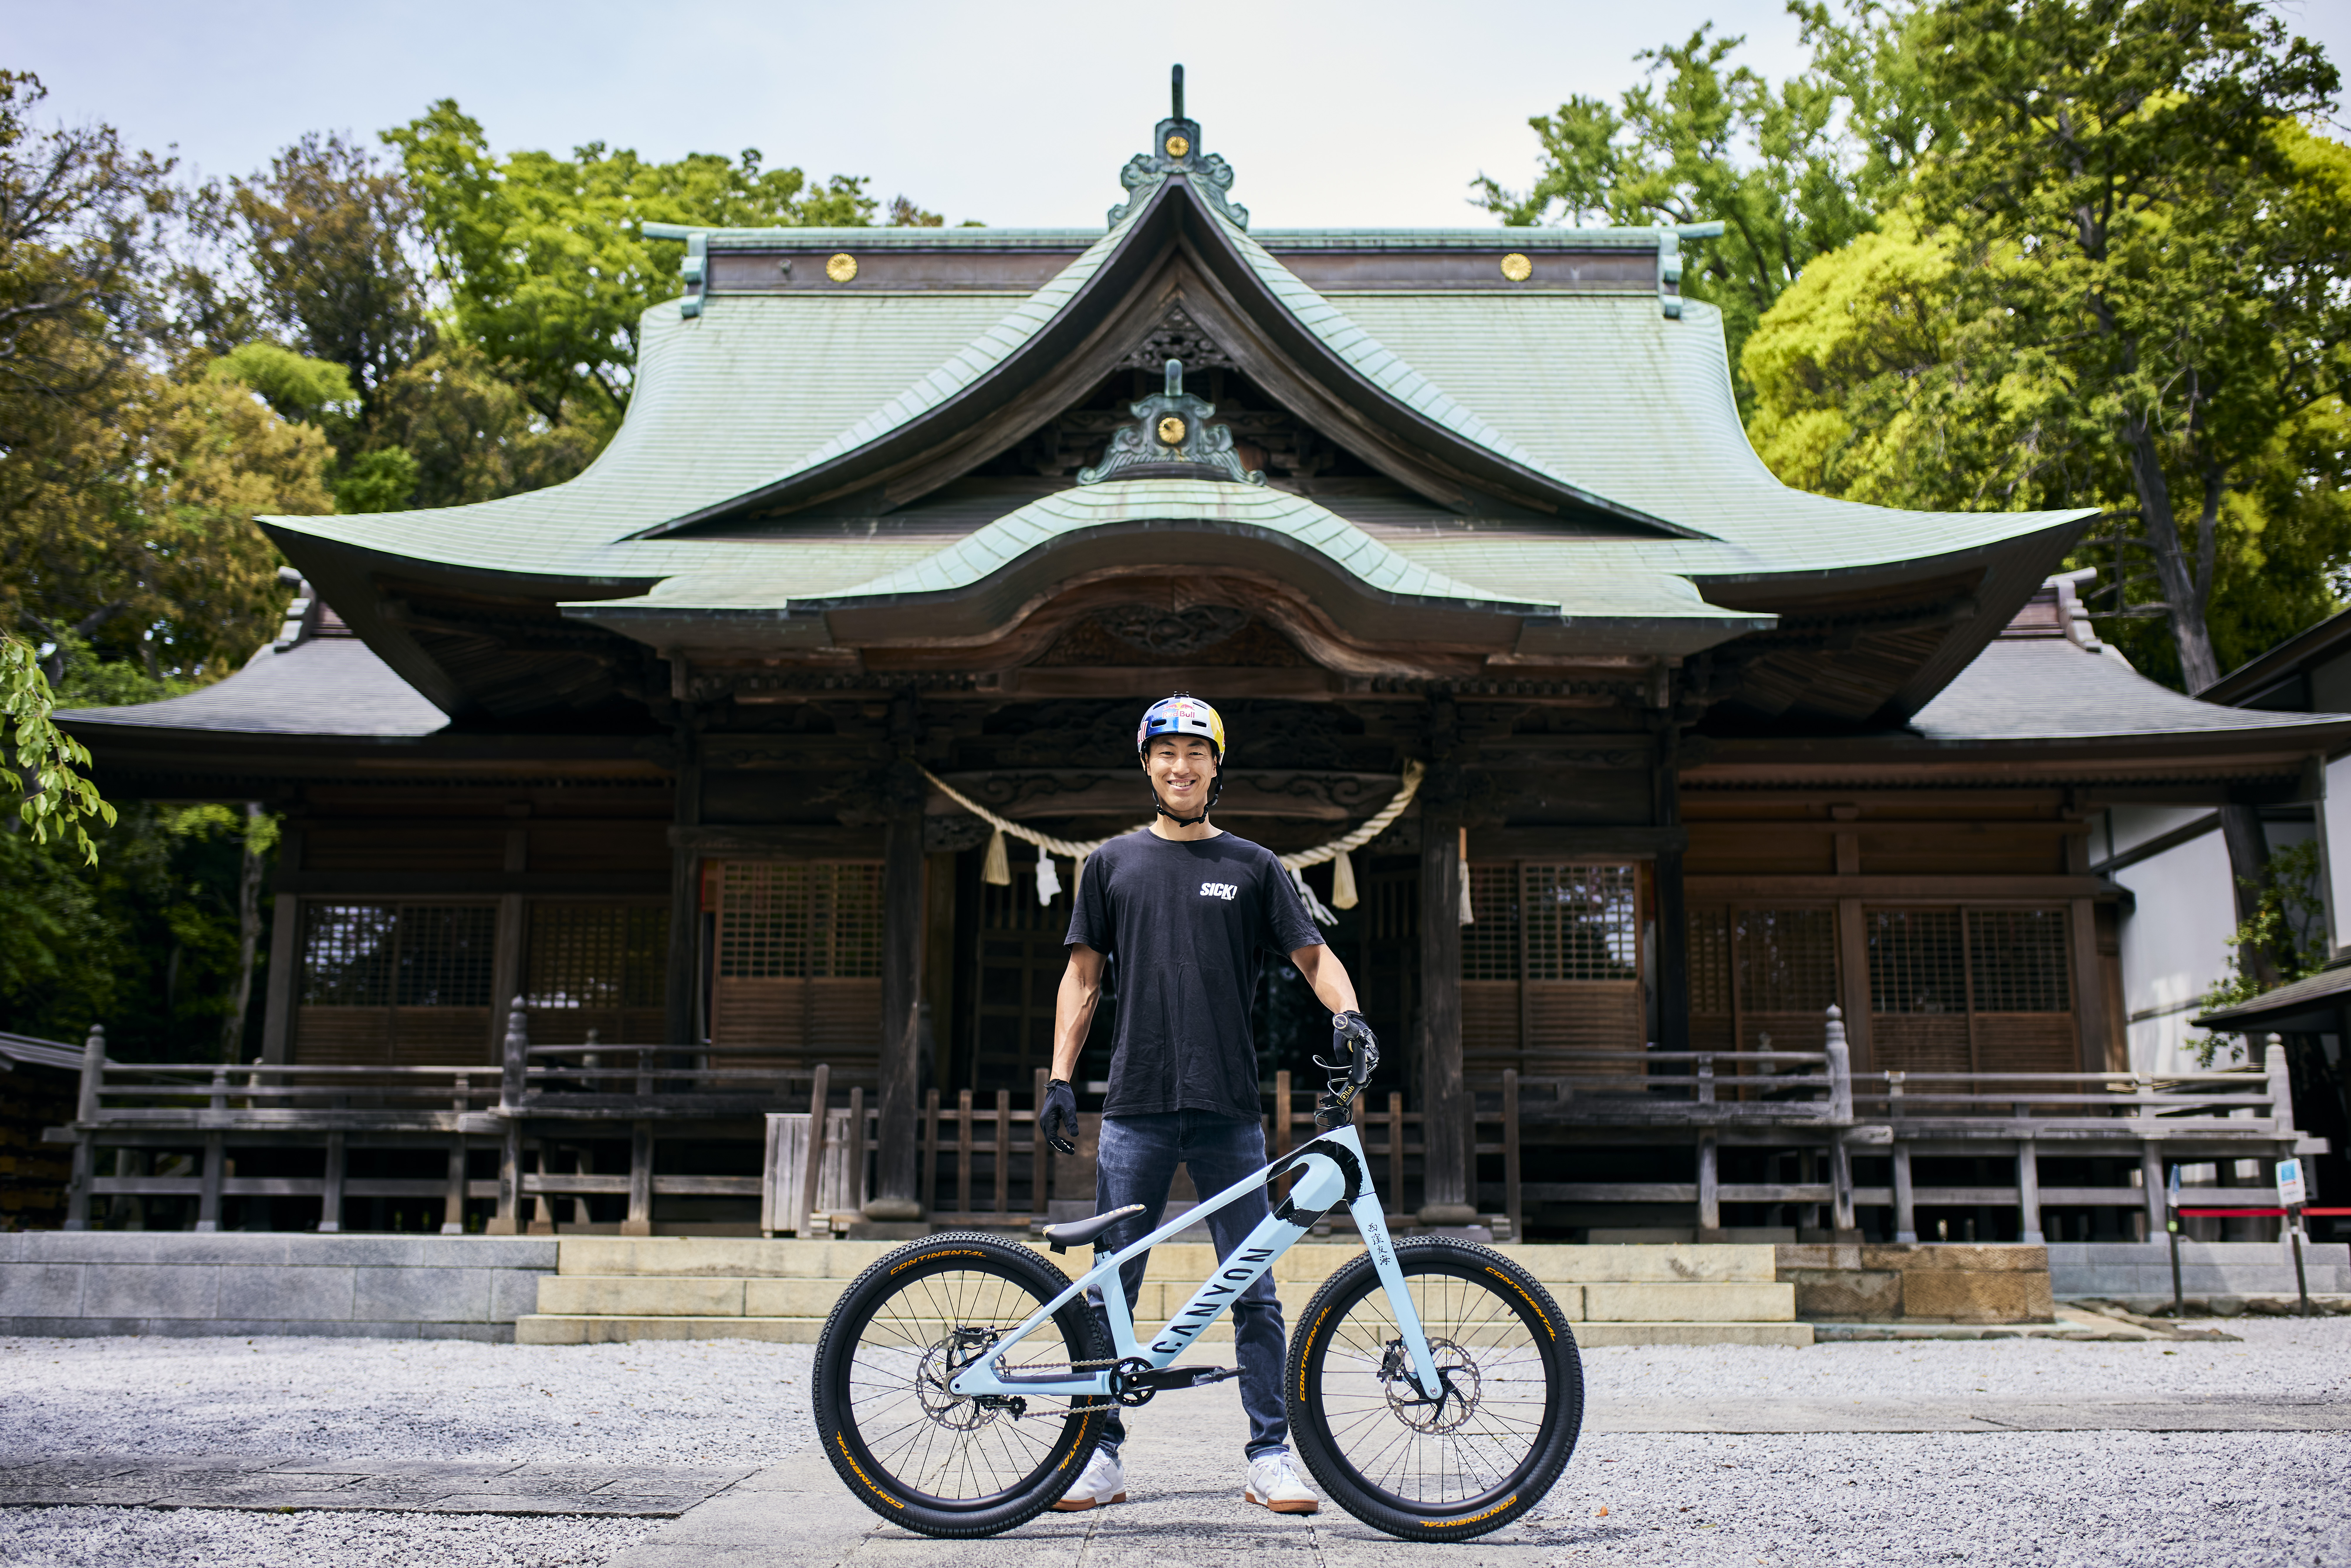 Canyon ficha al rider japonés Tomomi Nishikubo